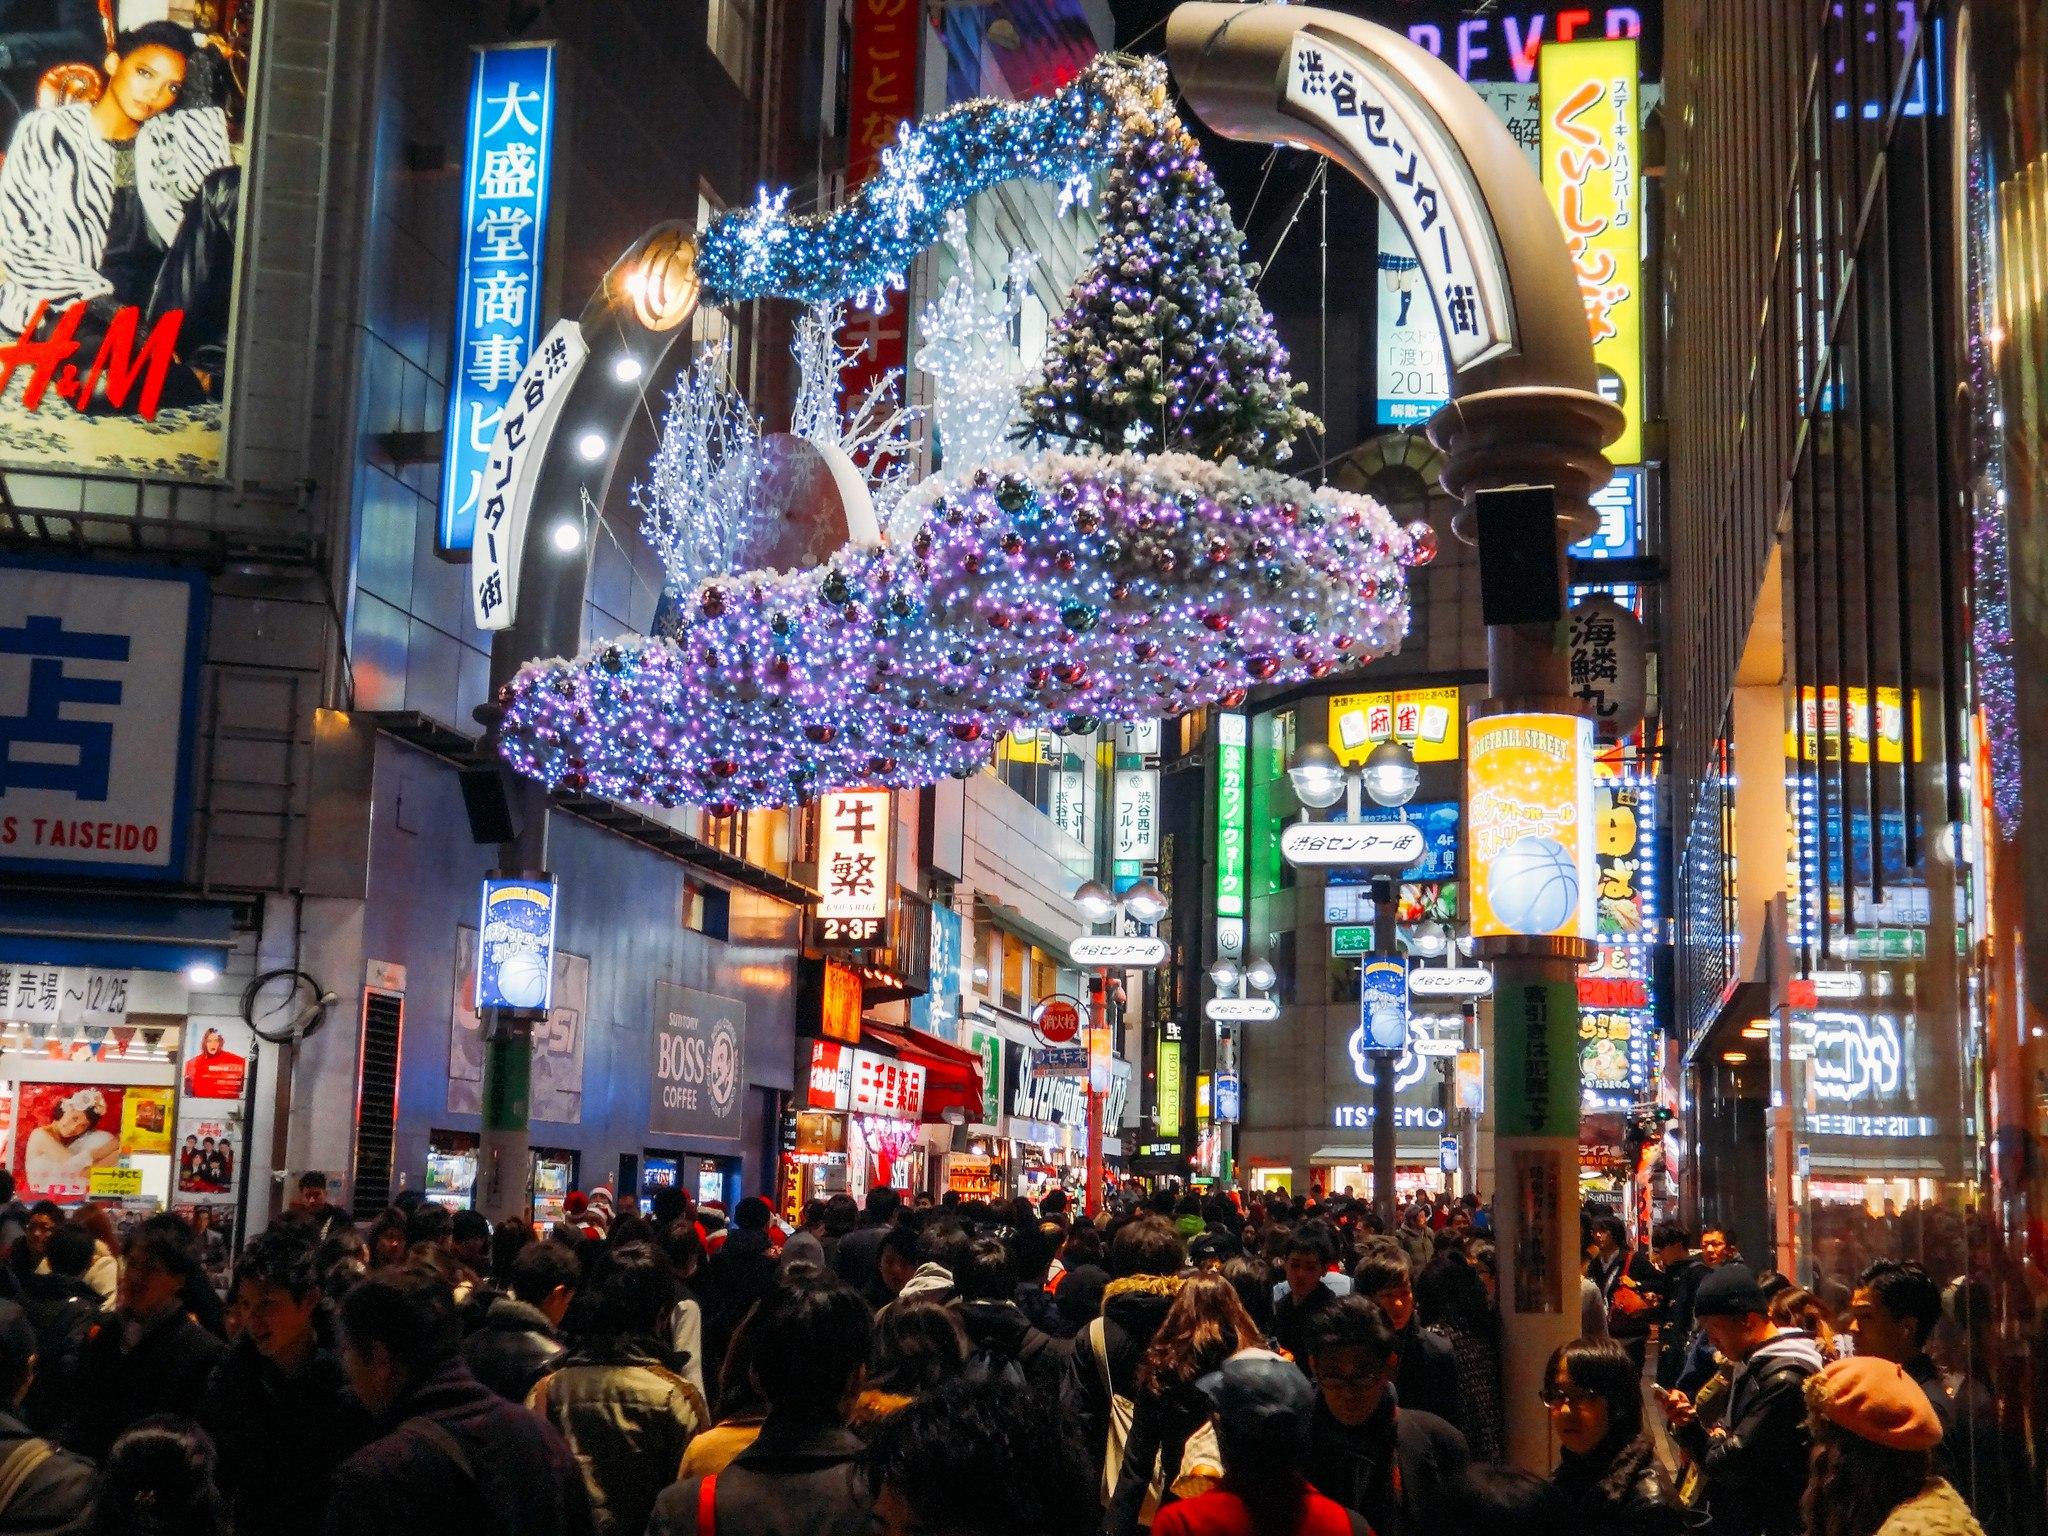 Things To Do in Shibuya, Japan